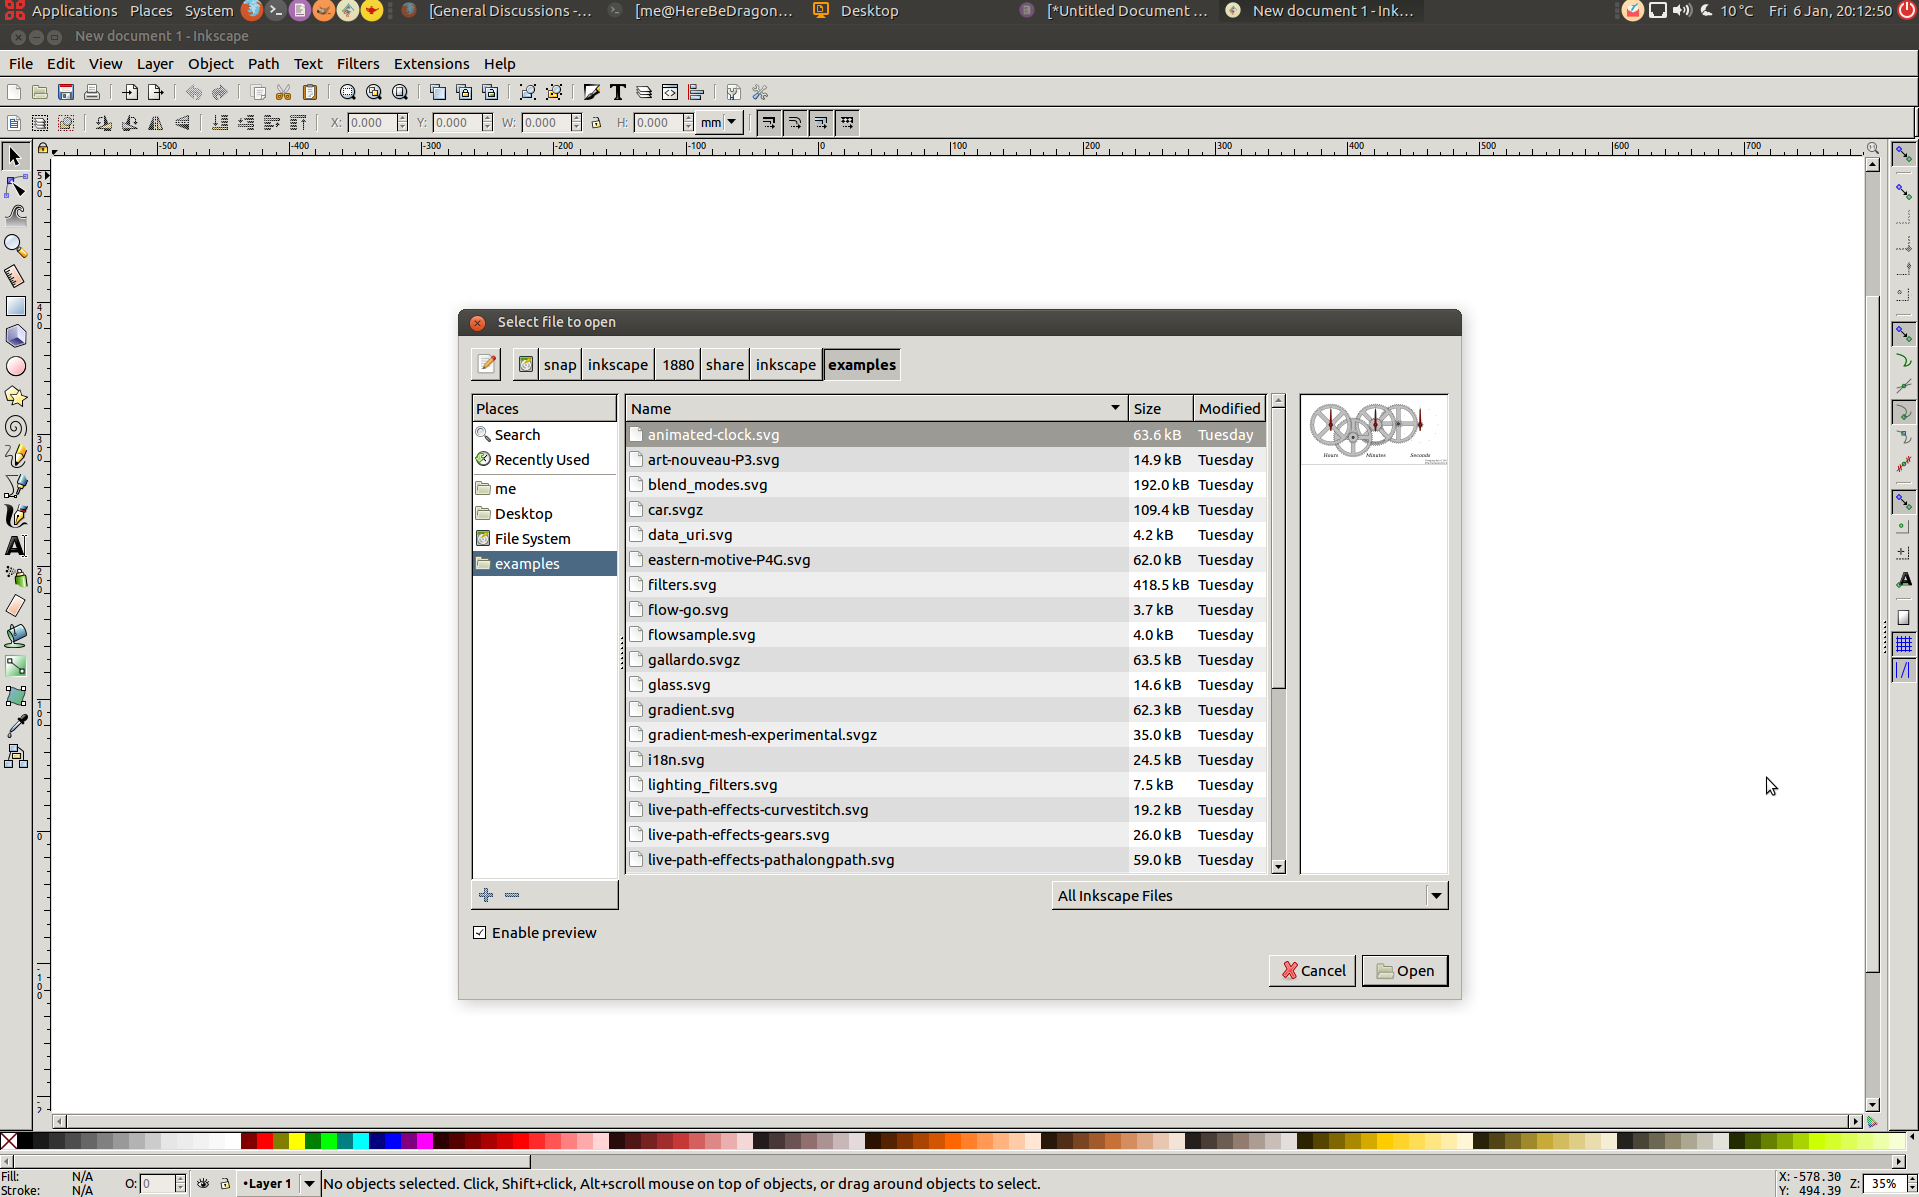 Installed 0 92 via snap on ubuntu - theme looks a bit